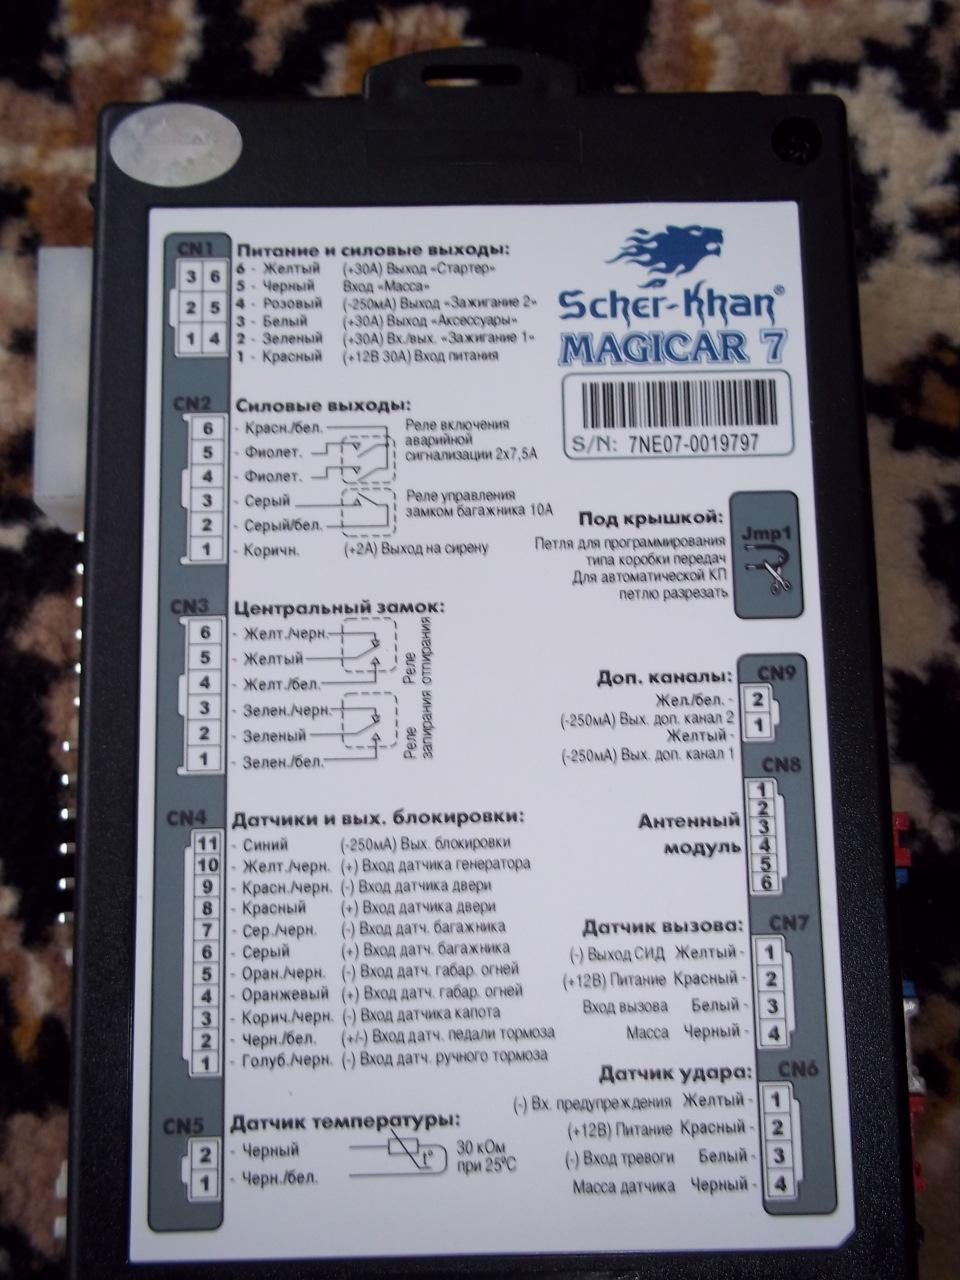 Scher-khan magicar 7 инструкция, характеристики, форум.